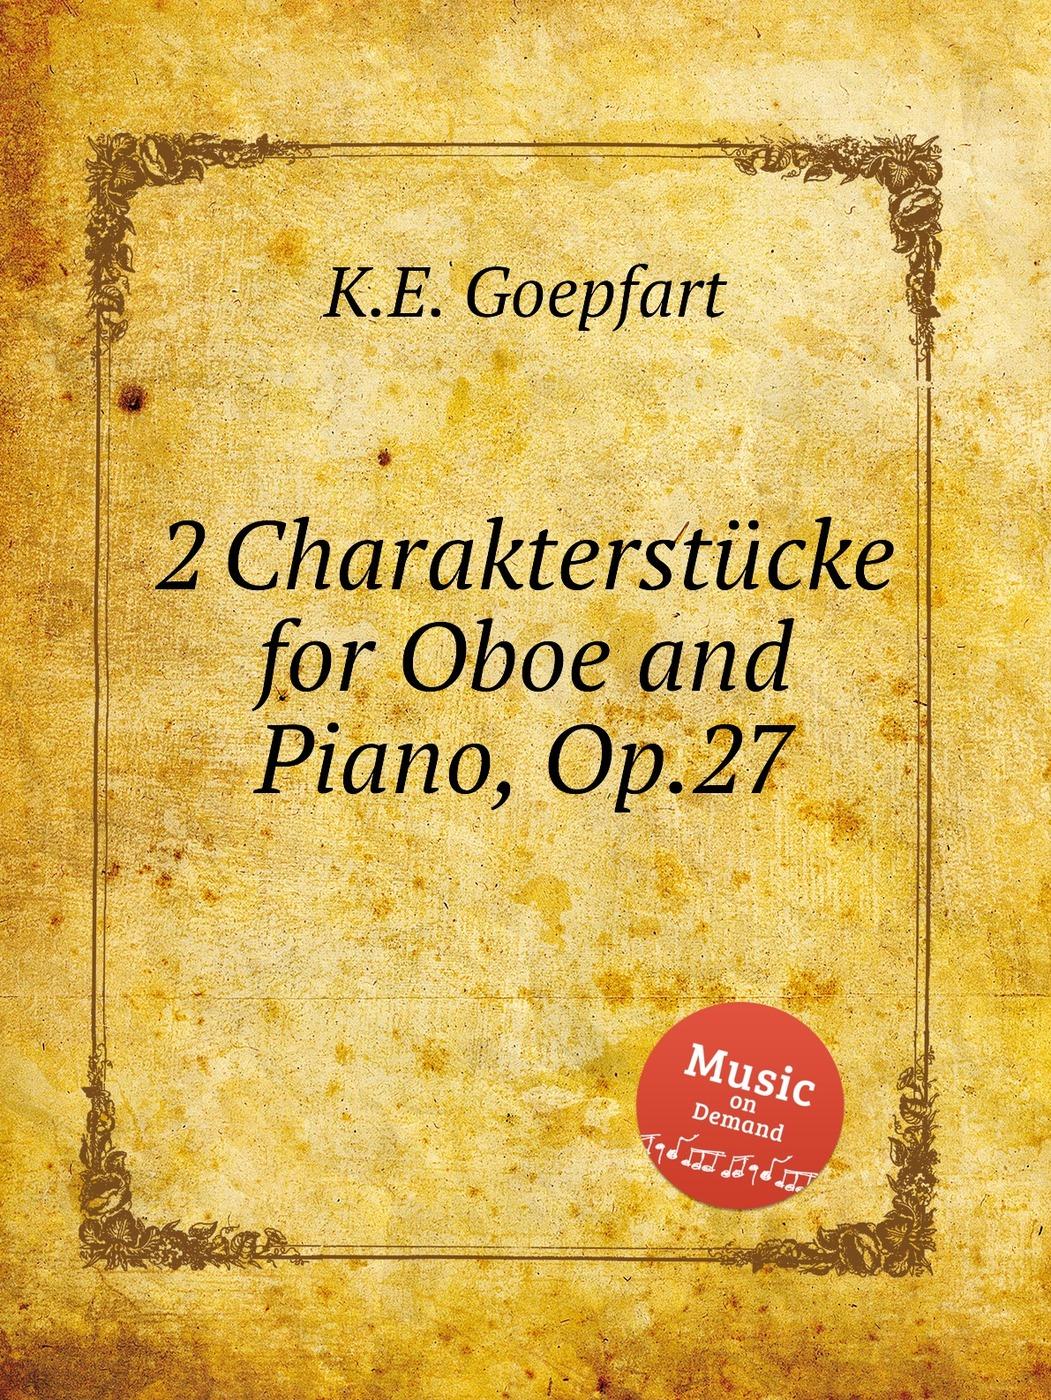 2 Charakterstucke for Oboe and Piano, Op.27